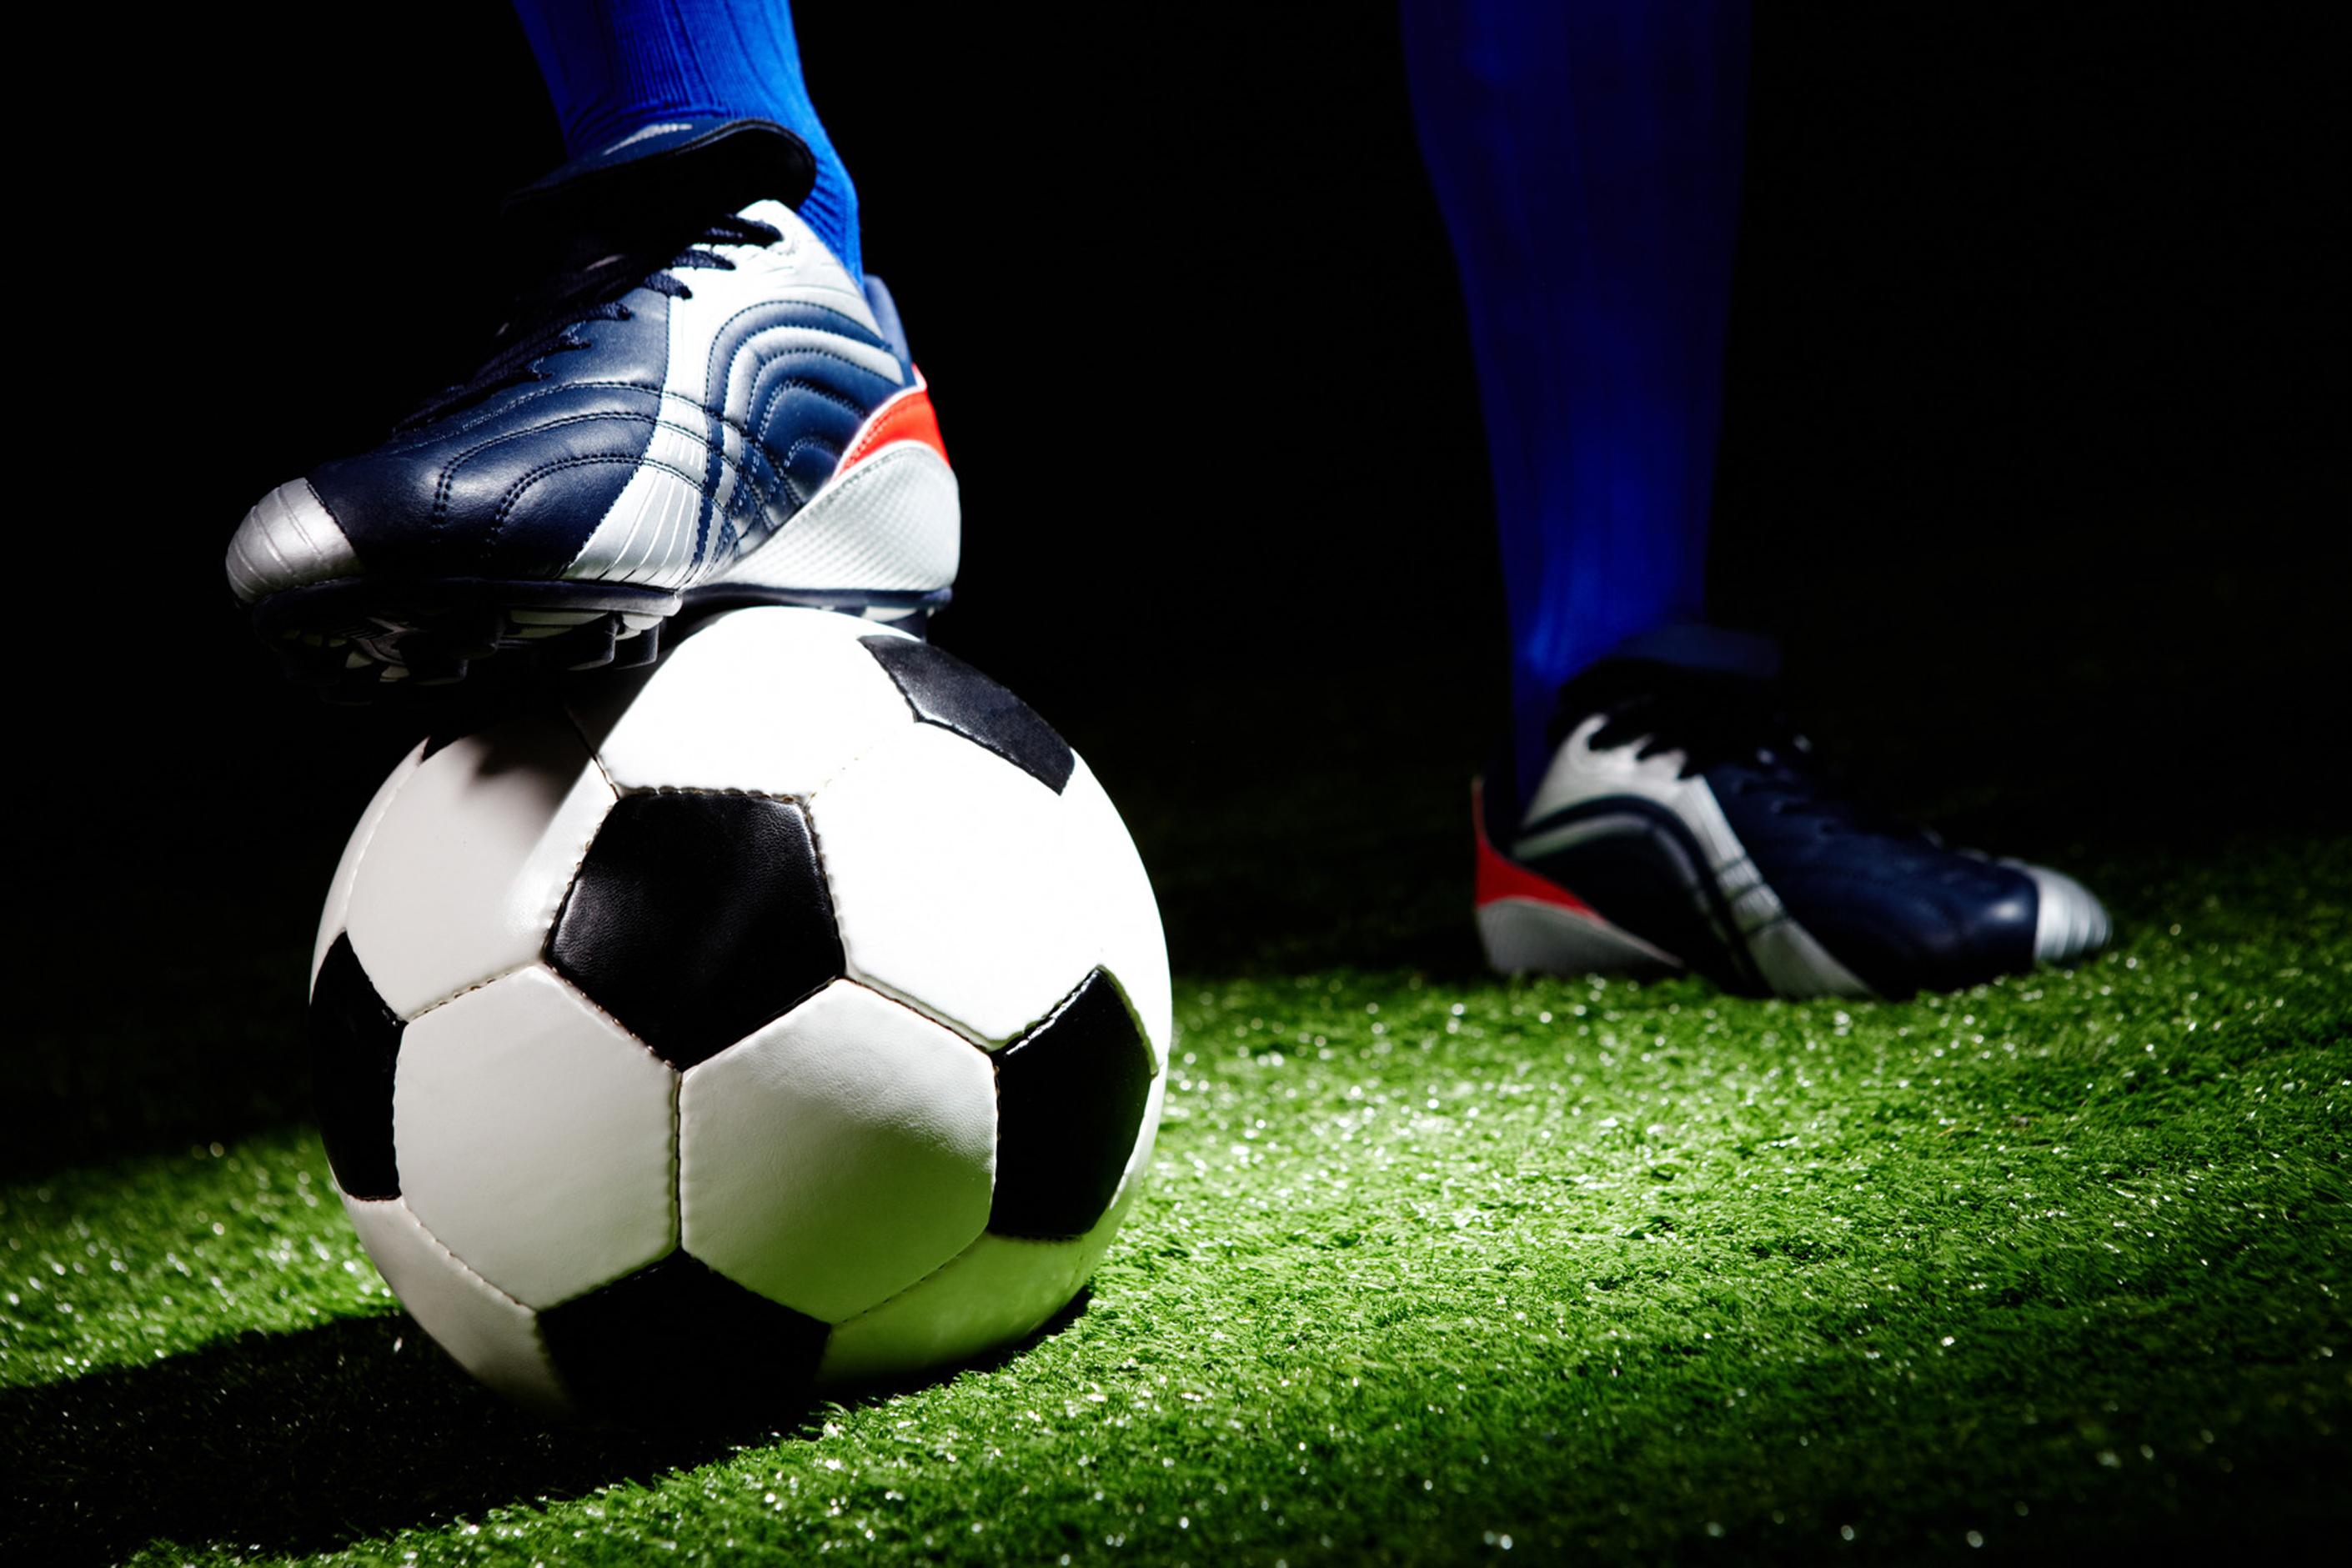 photodune-367863-soccer-ball-m1